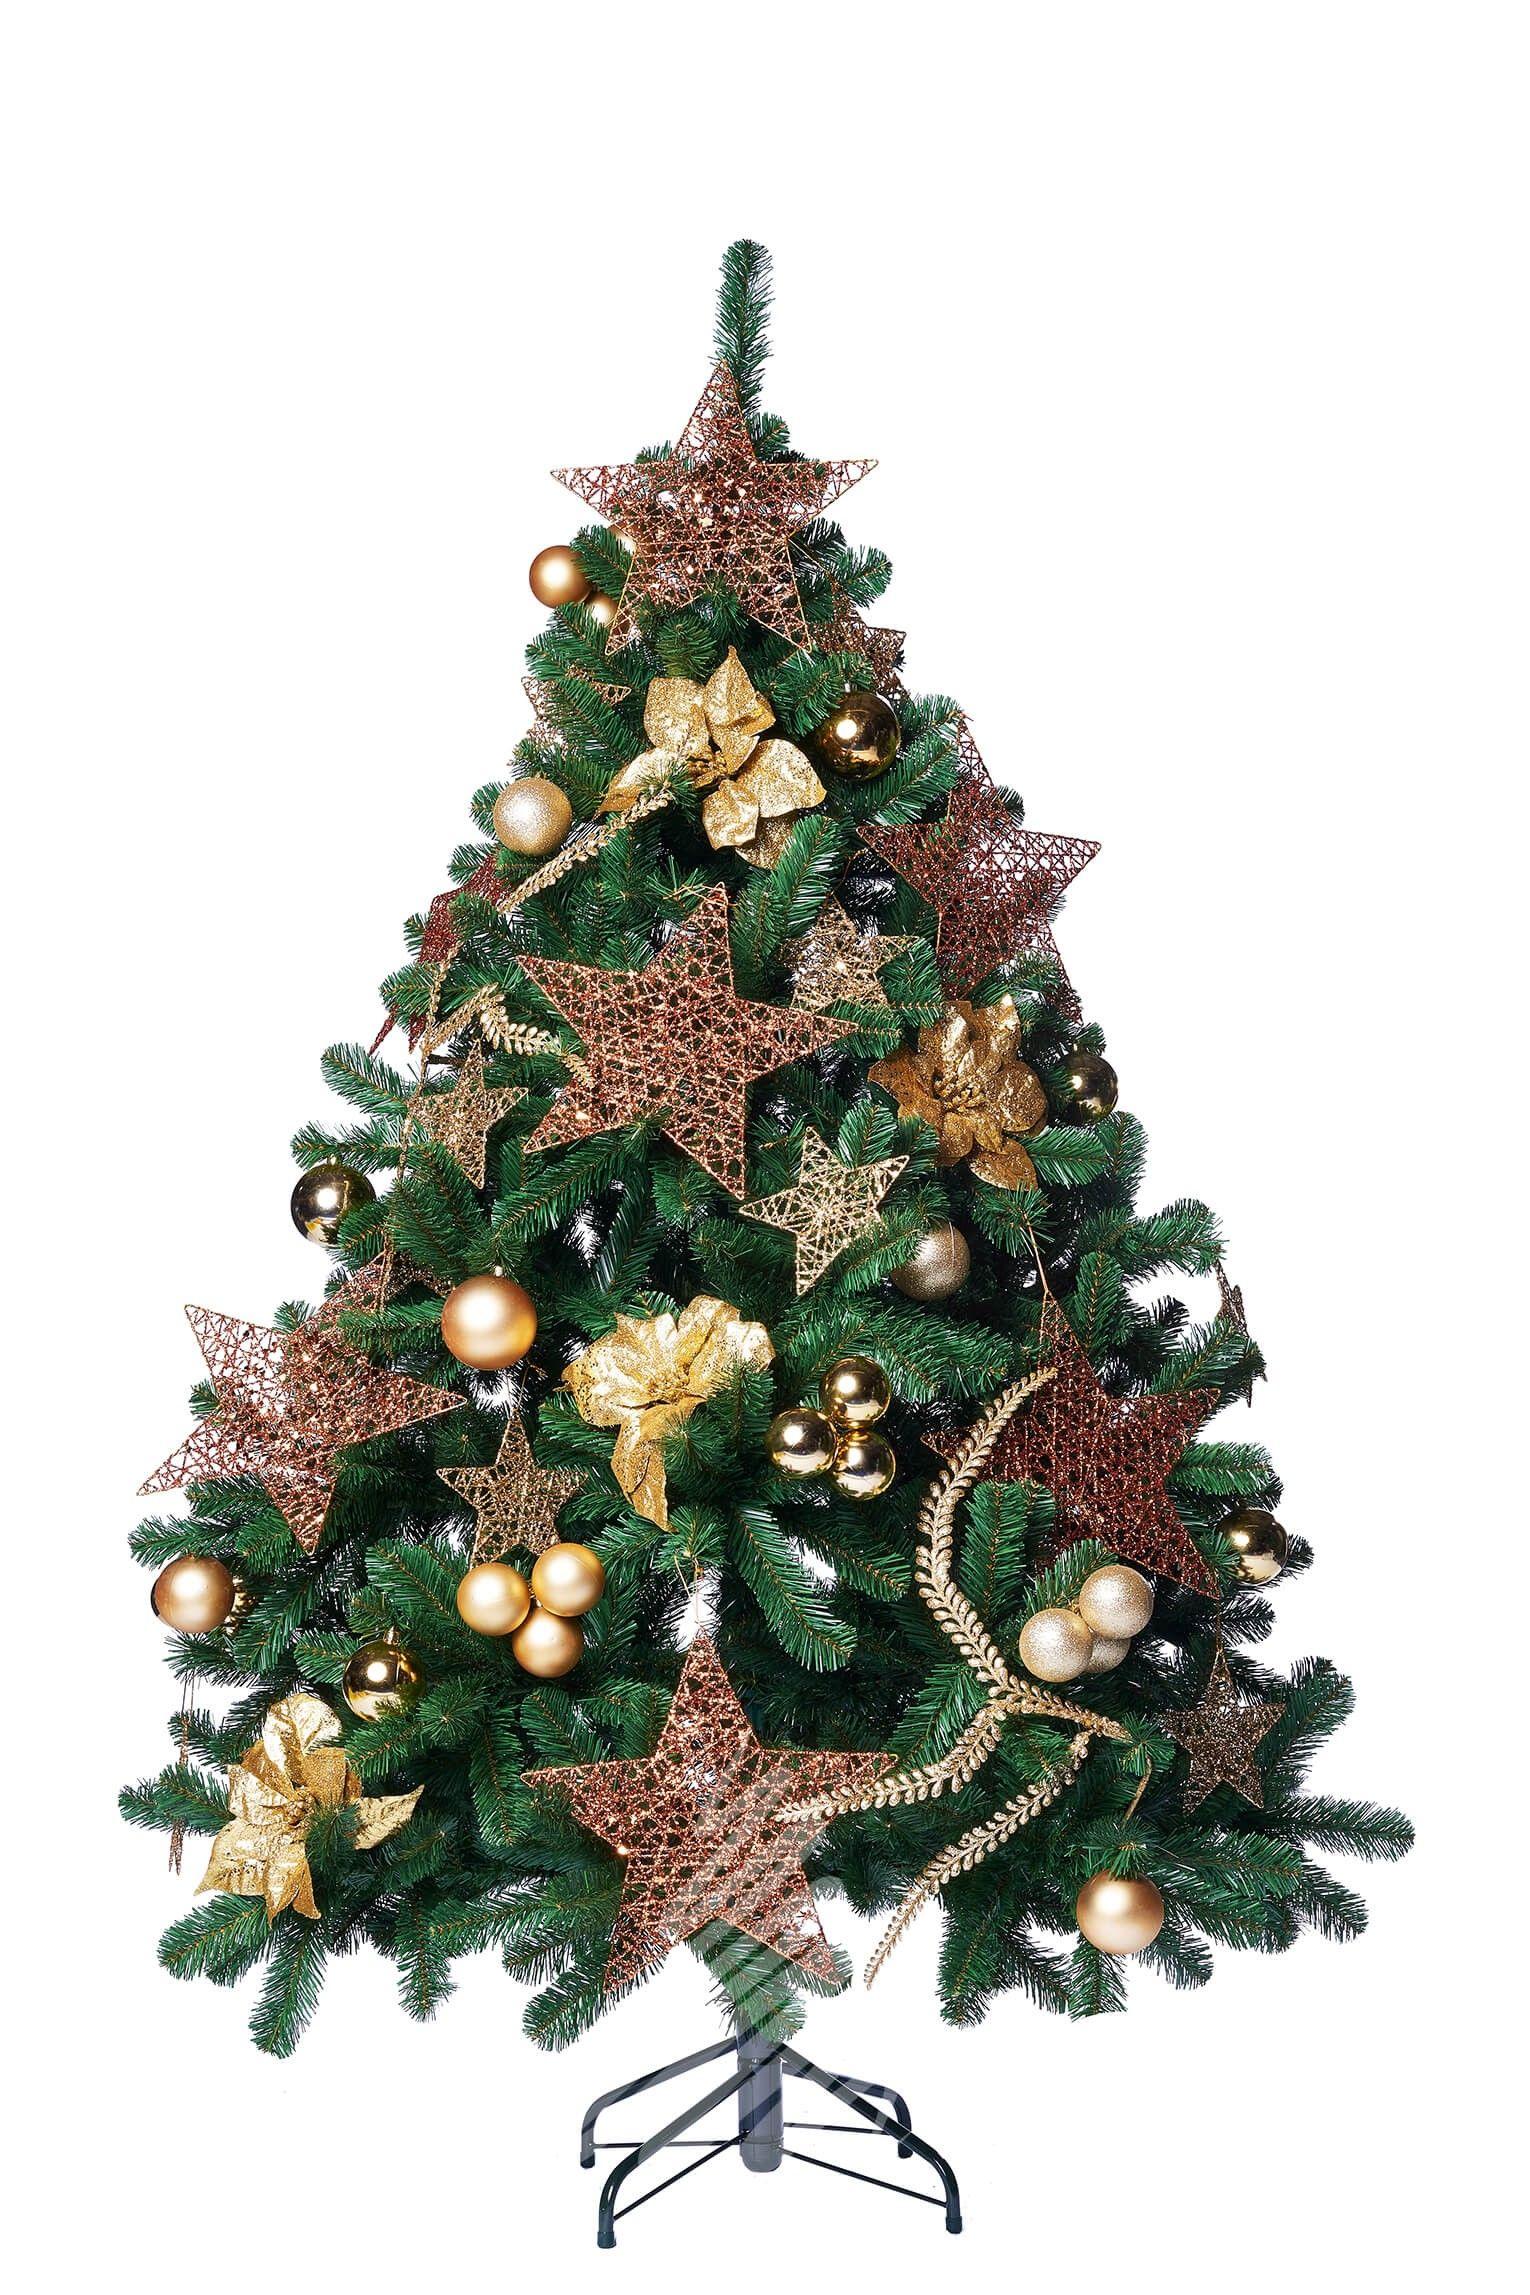 Jewel Pine 6ft Decorated Artificial Christmas Tree | Christmas Tree ...